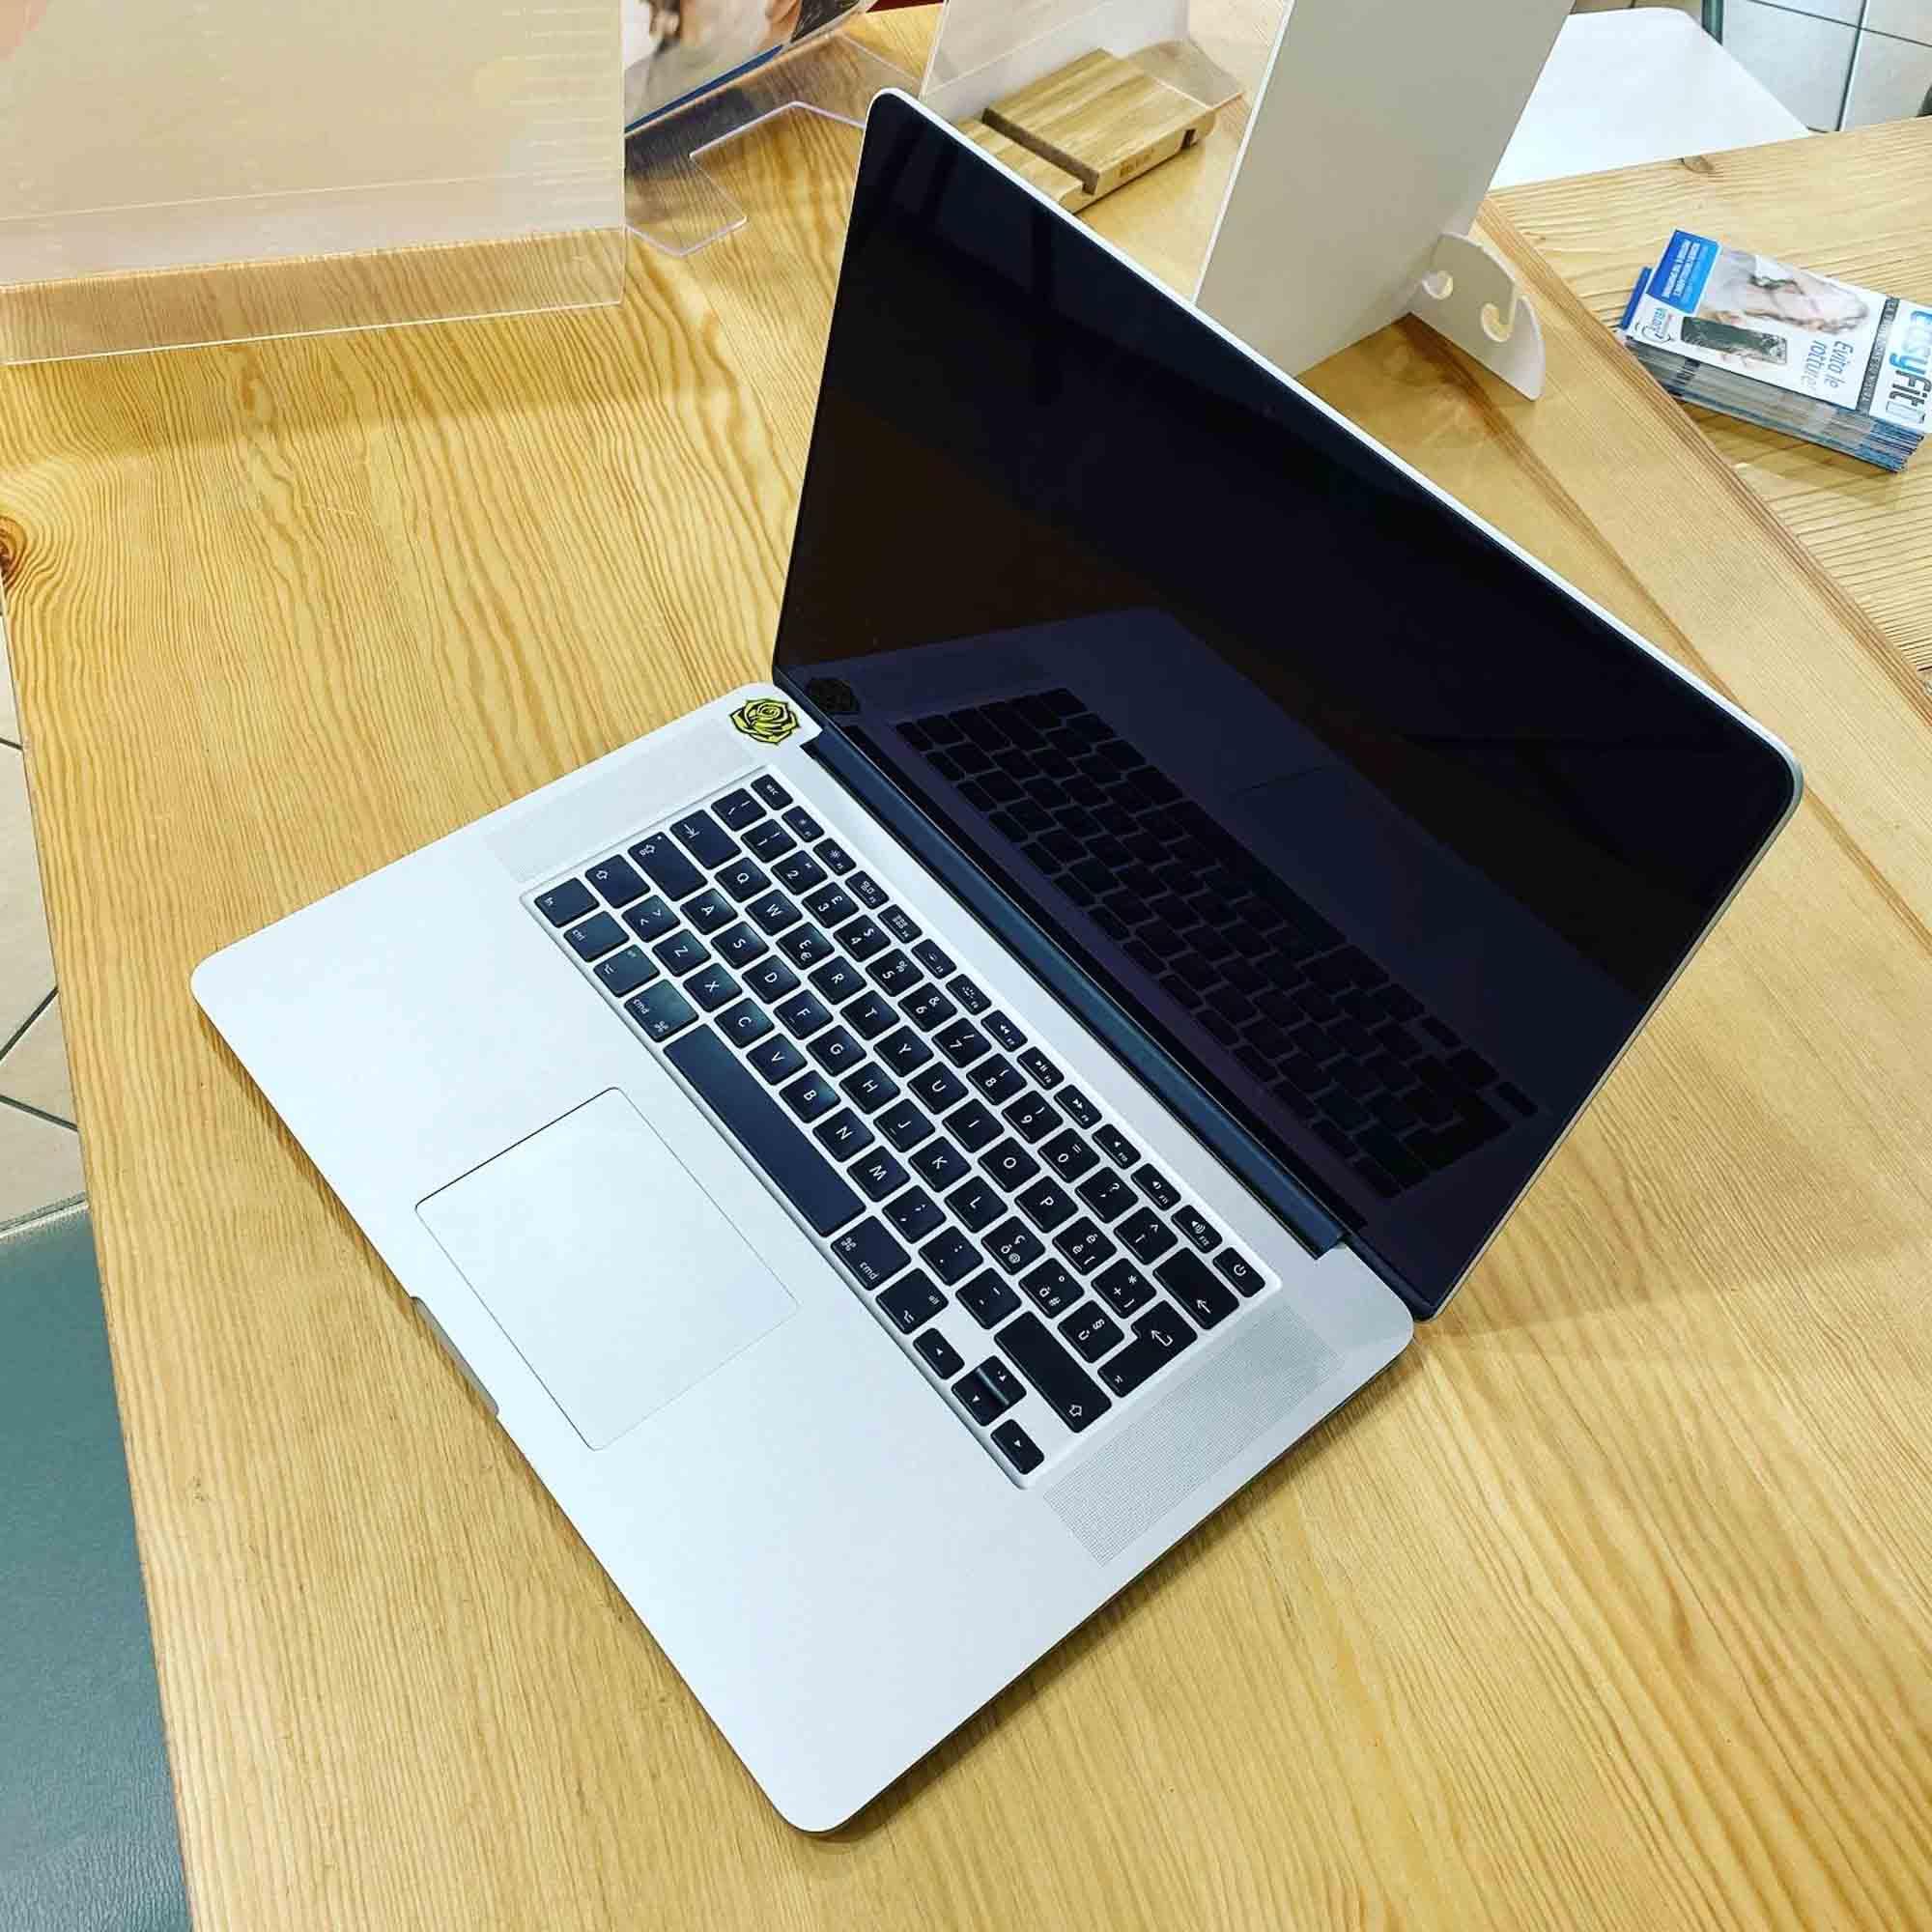 Sostituzione pasta termica su Apple MacBook Pro 2015 retina